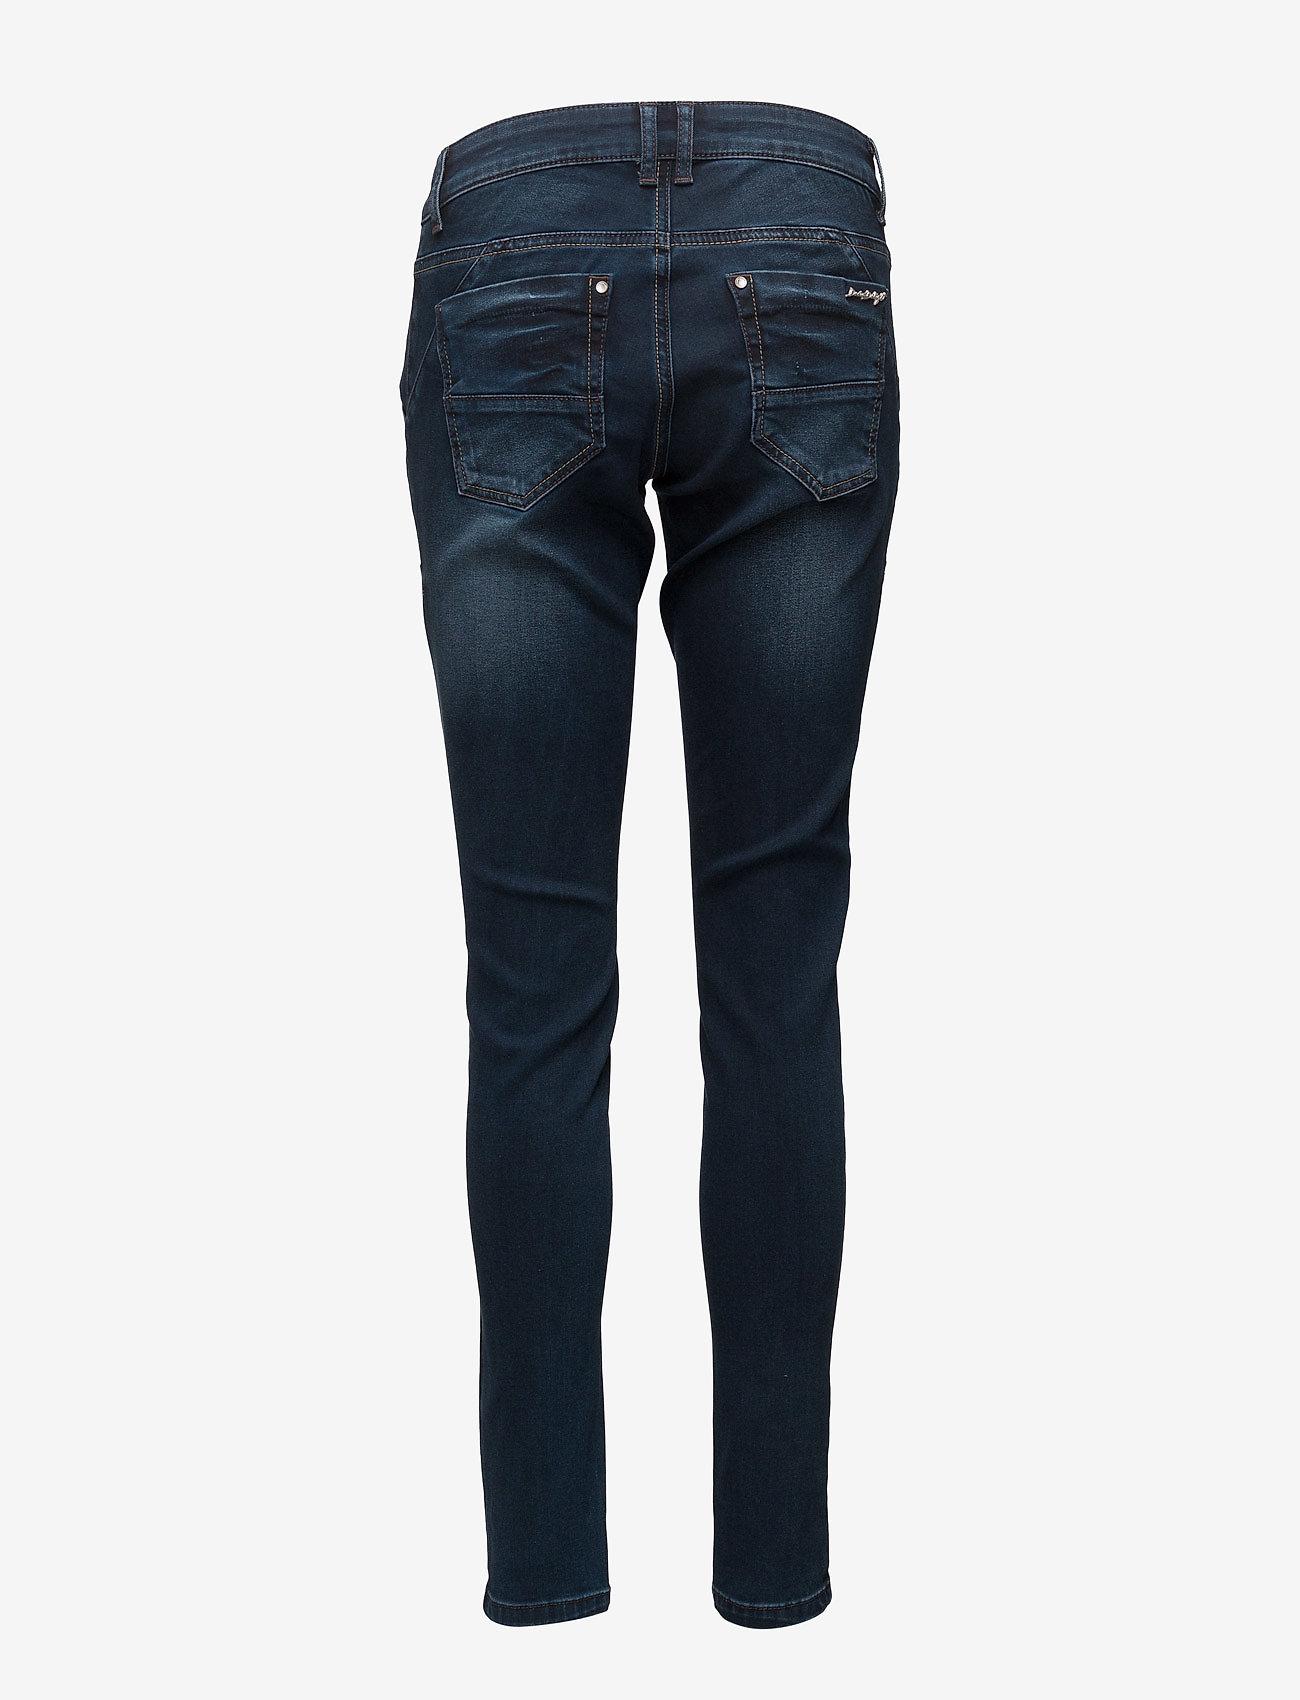 Cream - Baiily Power Stretch Jeans - džinsa bikses ar šaurām starām - dark blue denim - 1